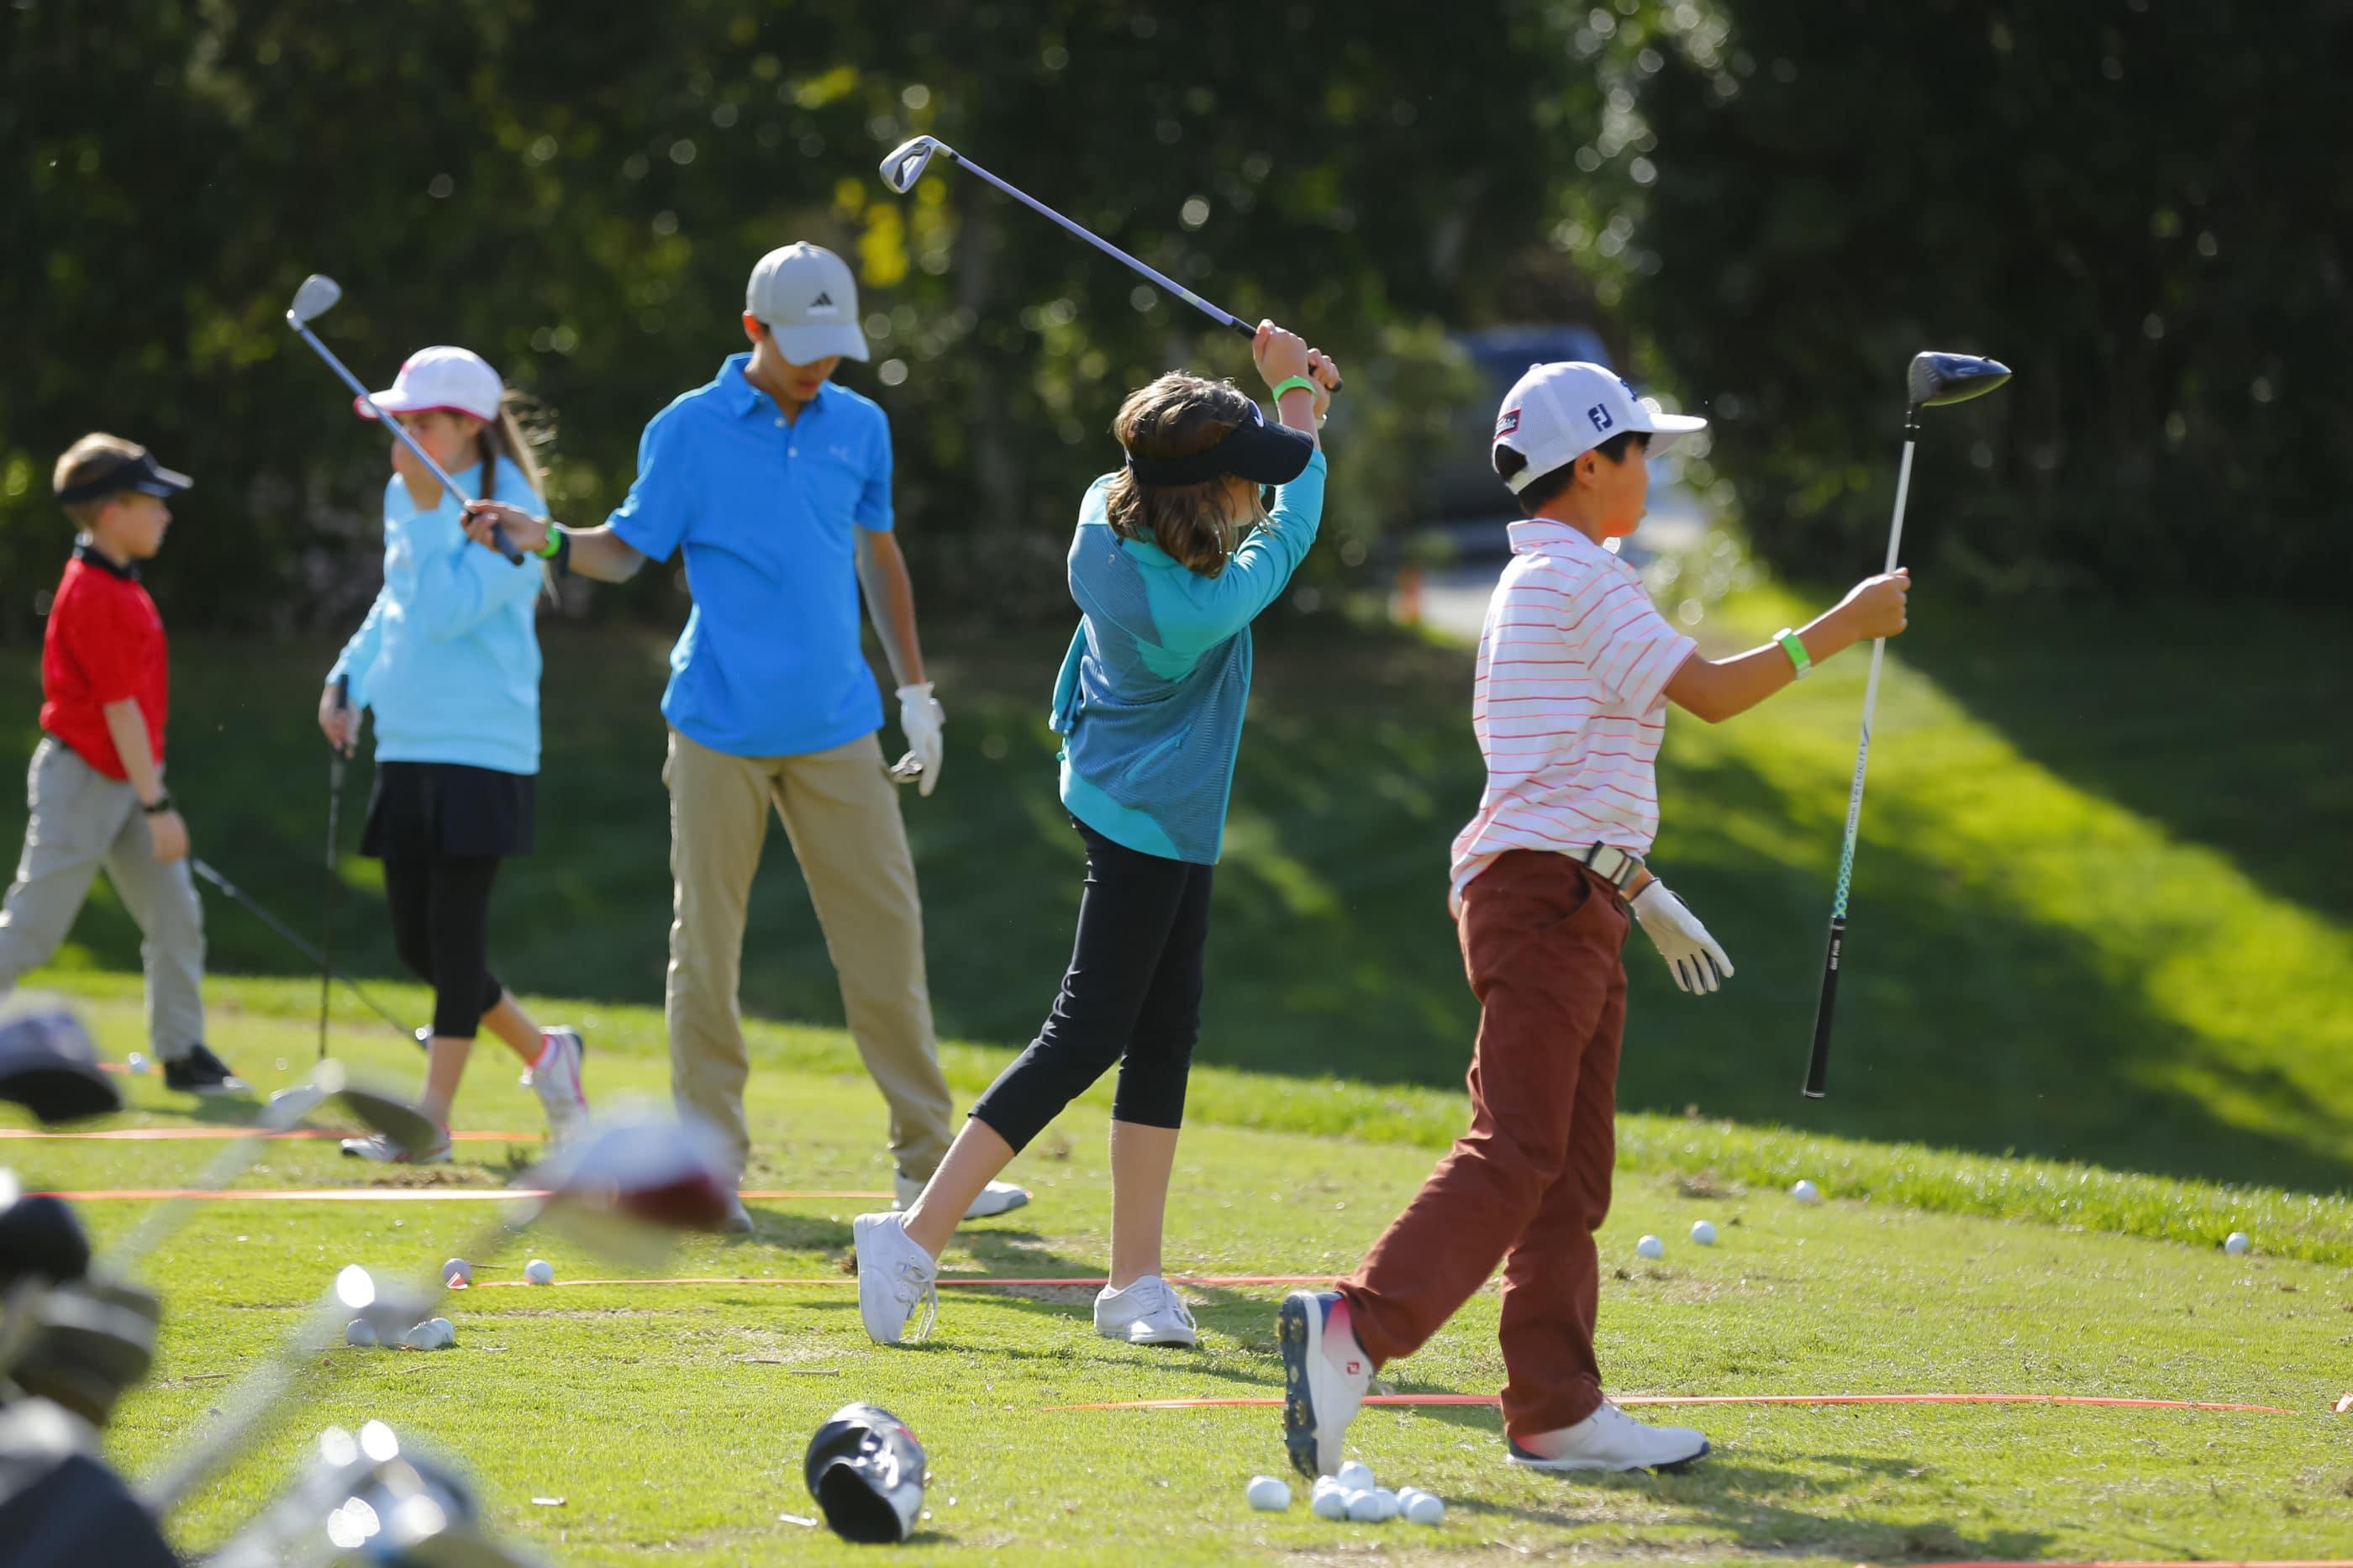 Junior Clinic at Kia Classic LPGA golf tournament at Aviara Golf Club in Carlsbad.